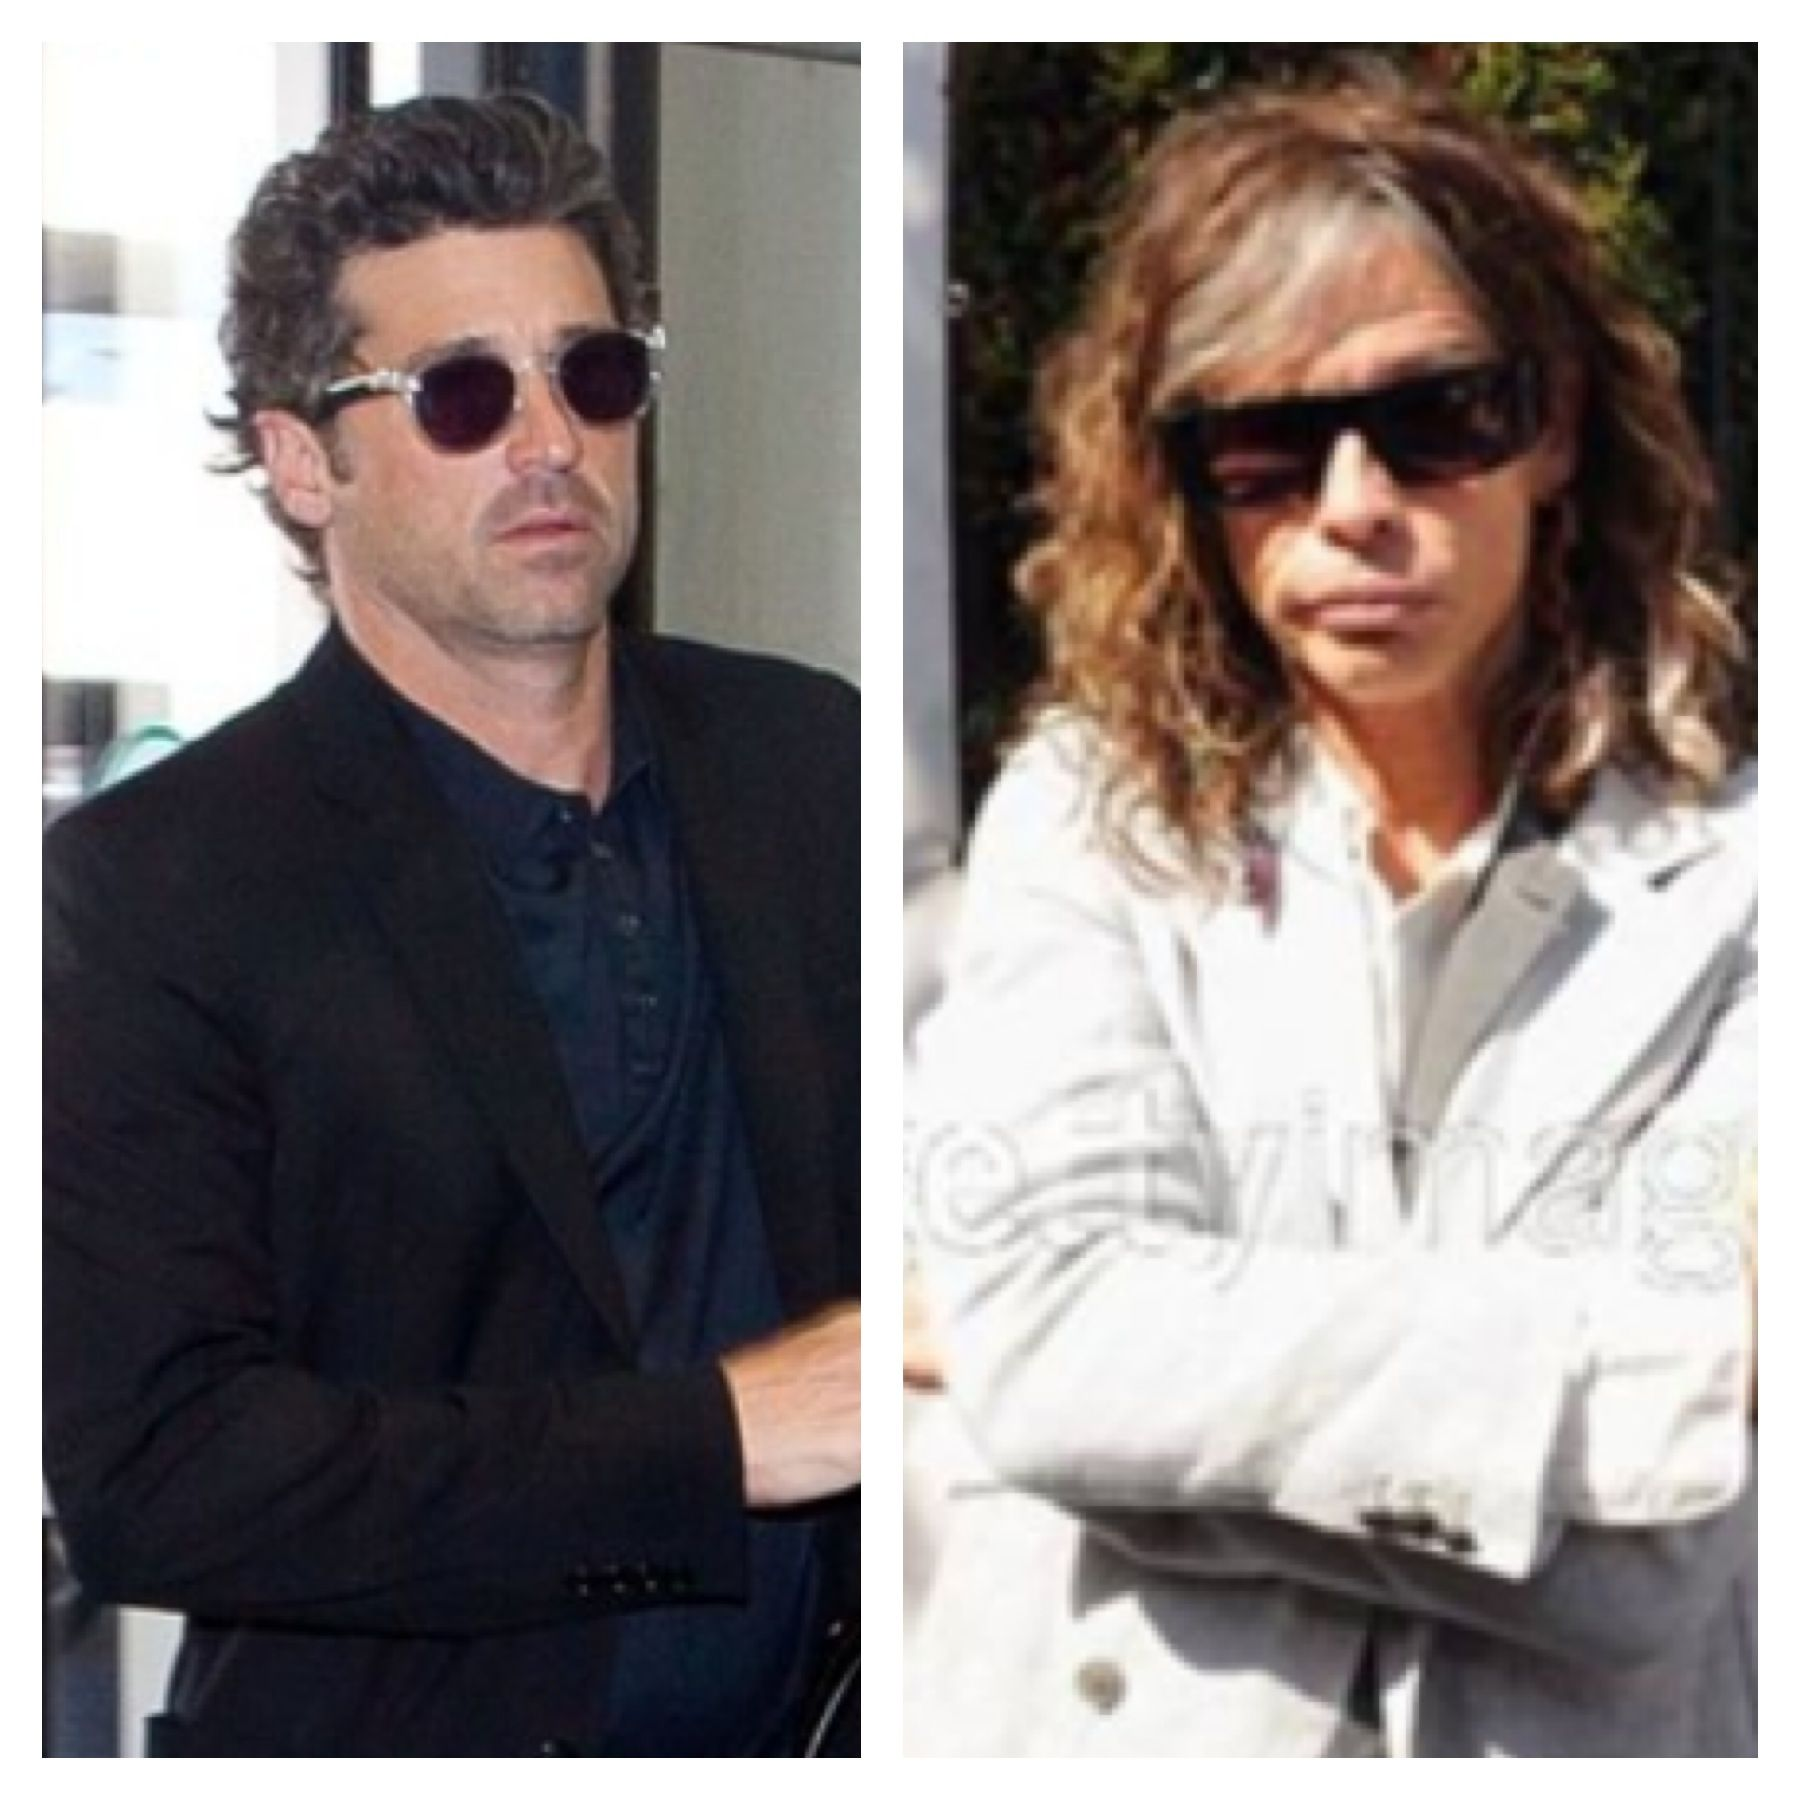 Patrick Dempsey And Steven Tyler In John Varvatos Sunglasses